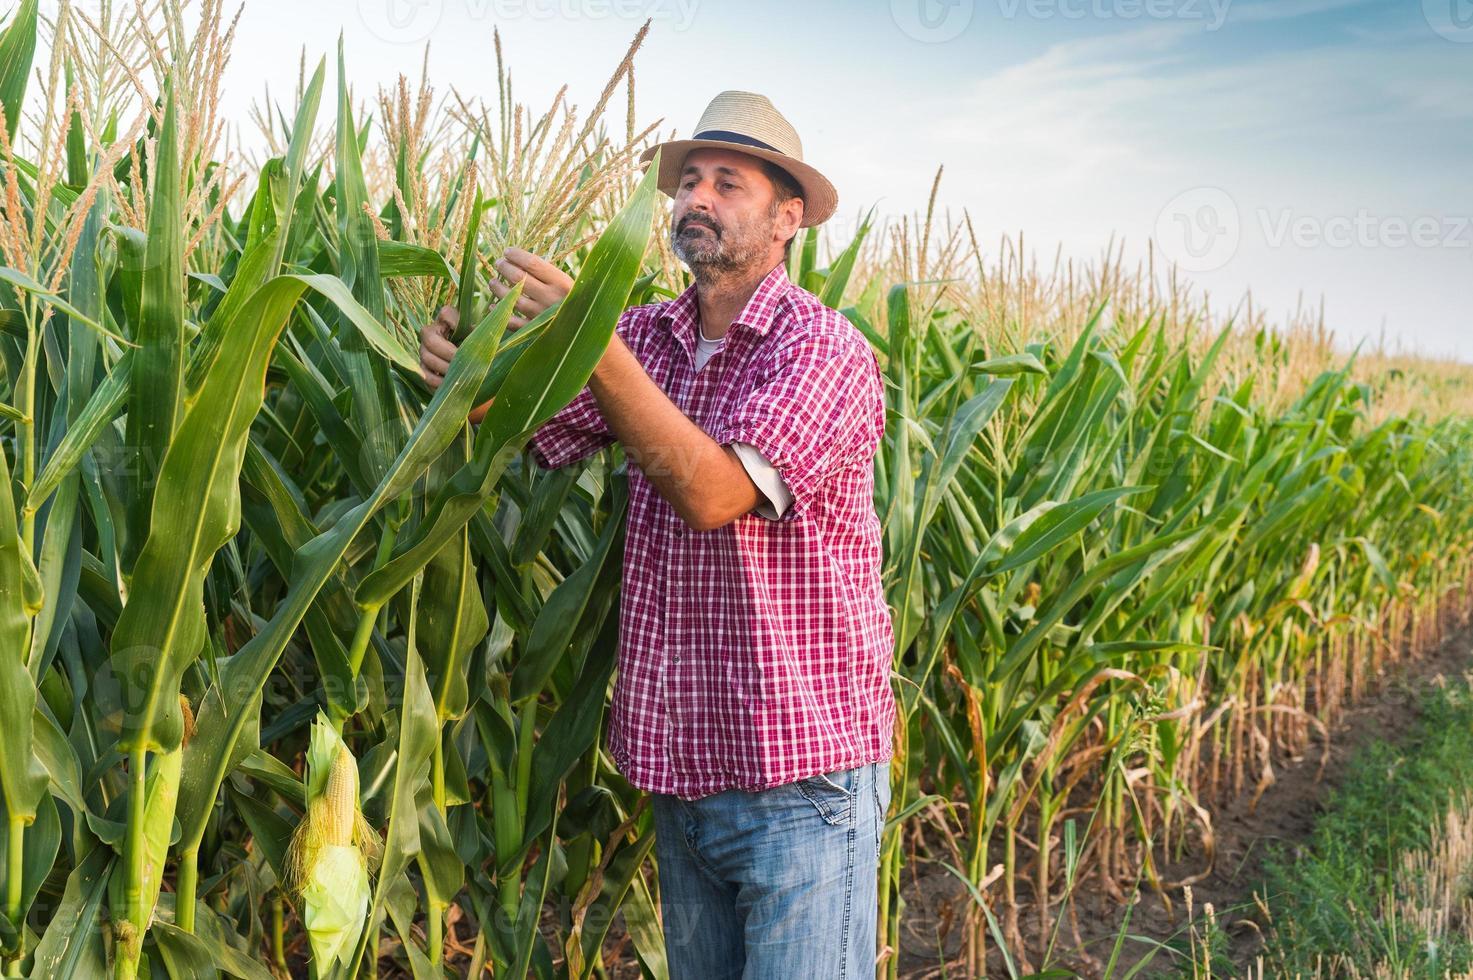 jordbrukare foto